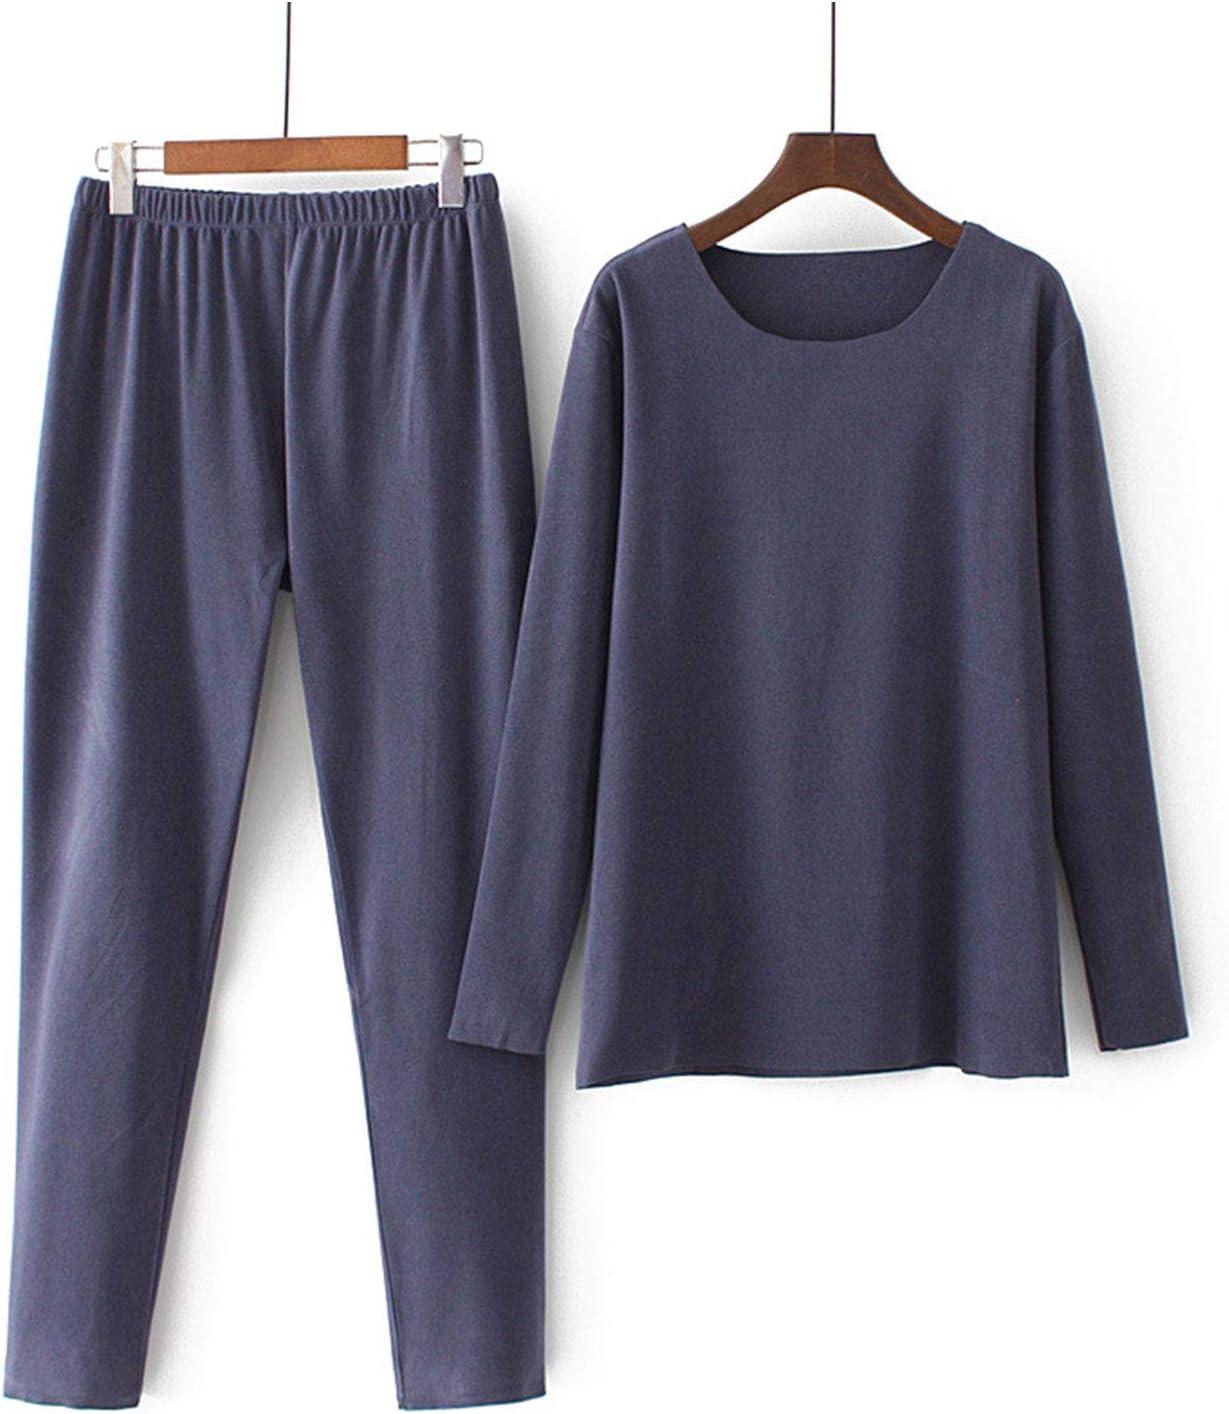 GQFGYYL Women Plus Size Thermal Underwear, Fleece Lined Top & Bottom Long Johns Set Winter Top&Pants Pajama,Navy Blue,XXXXL